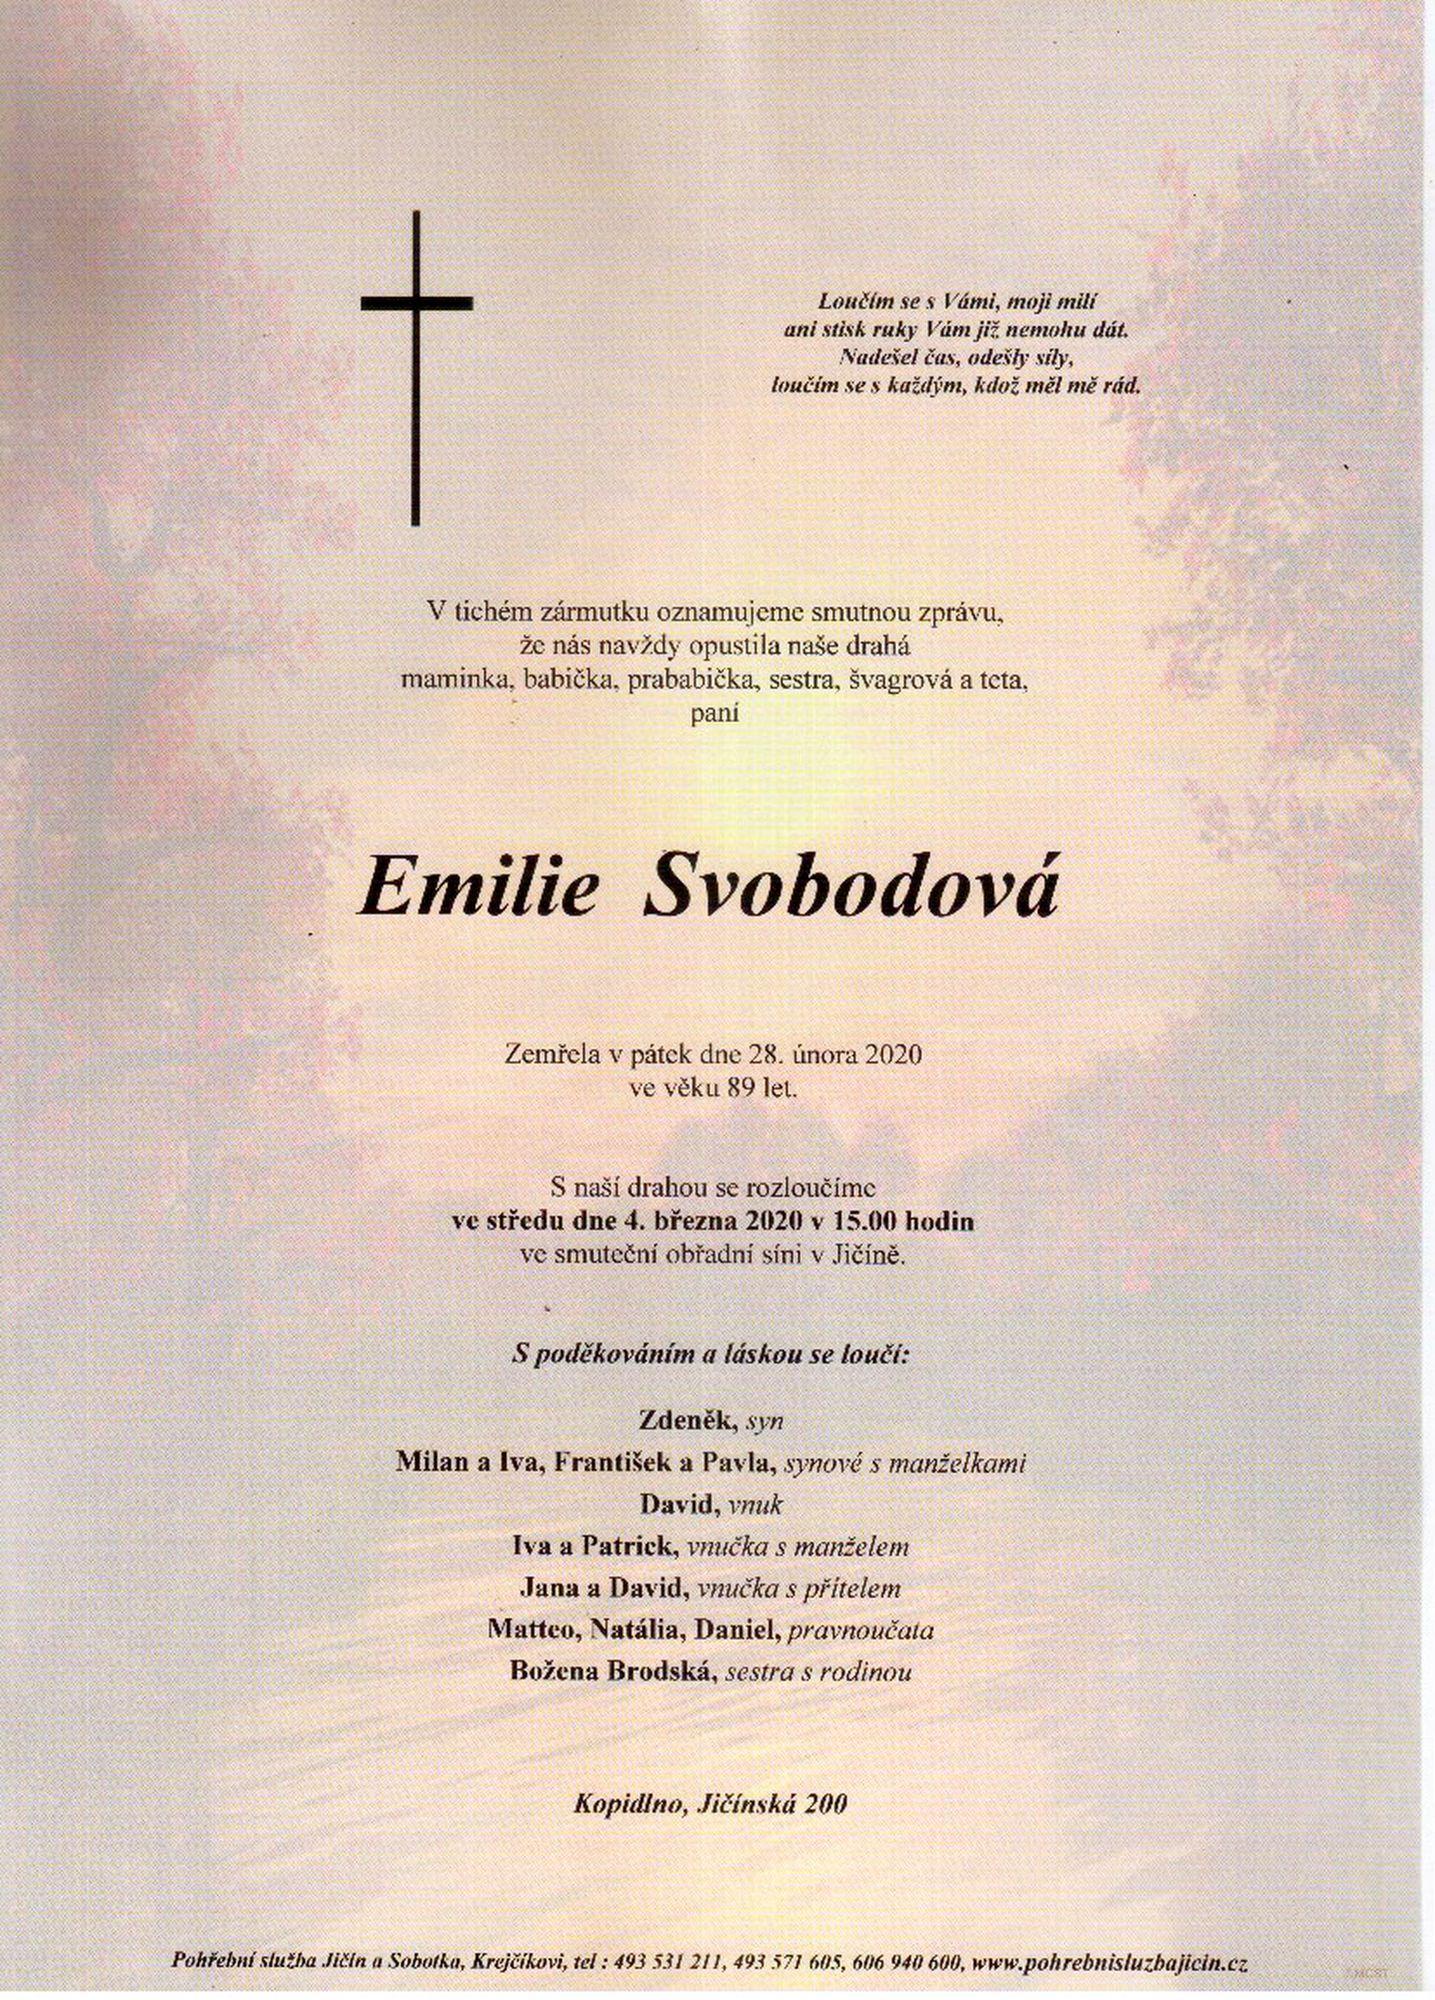 Emilie Svobodová